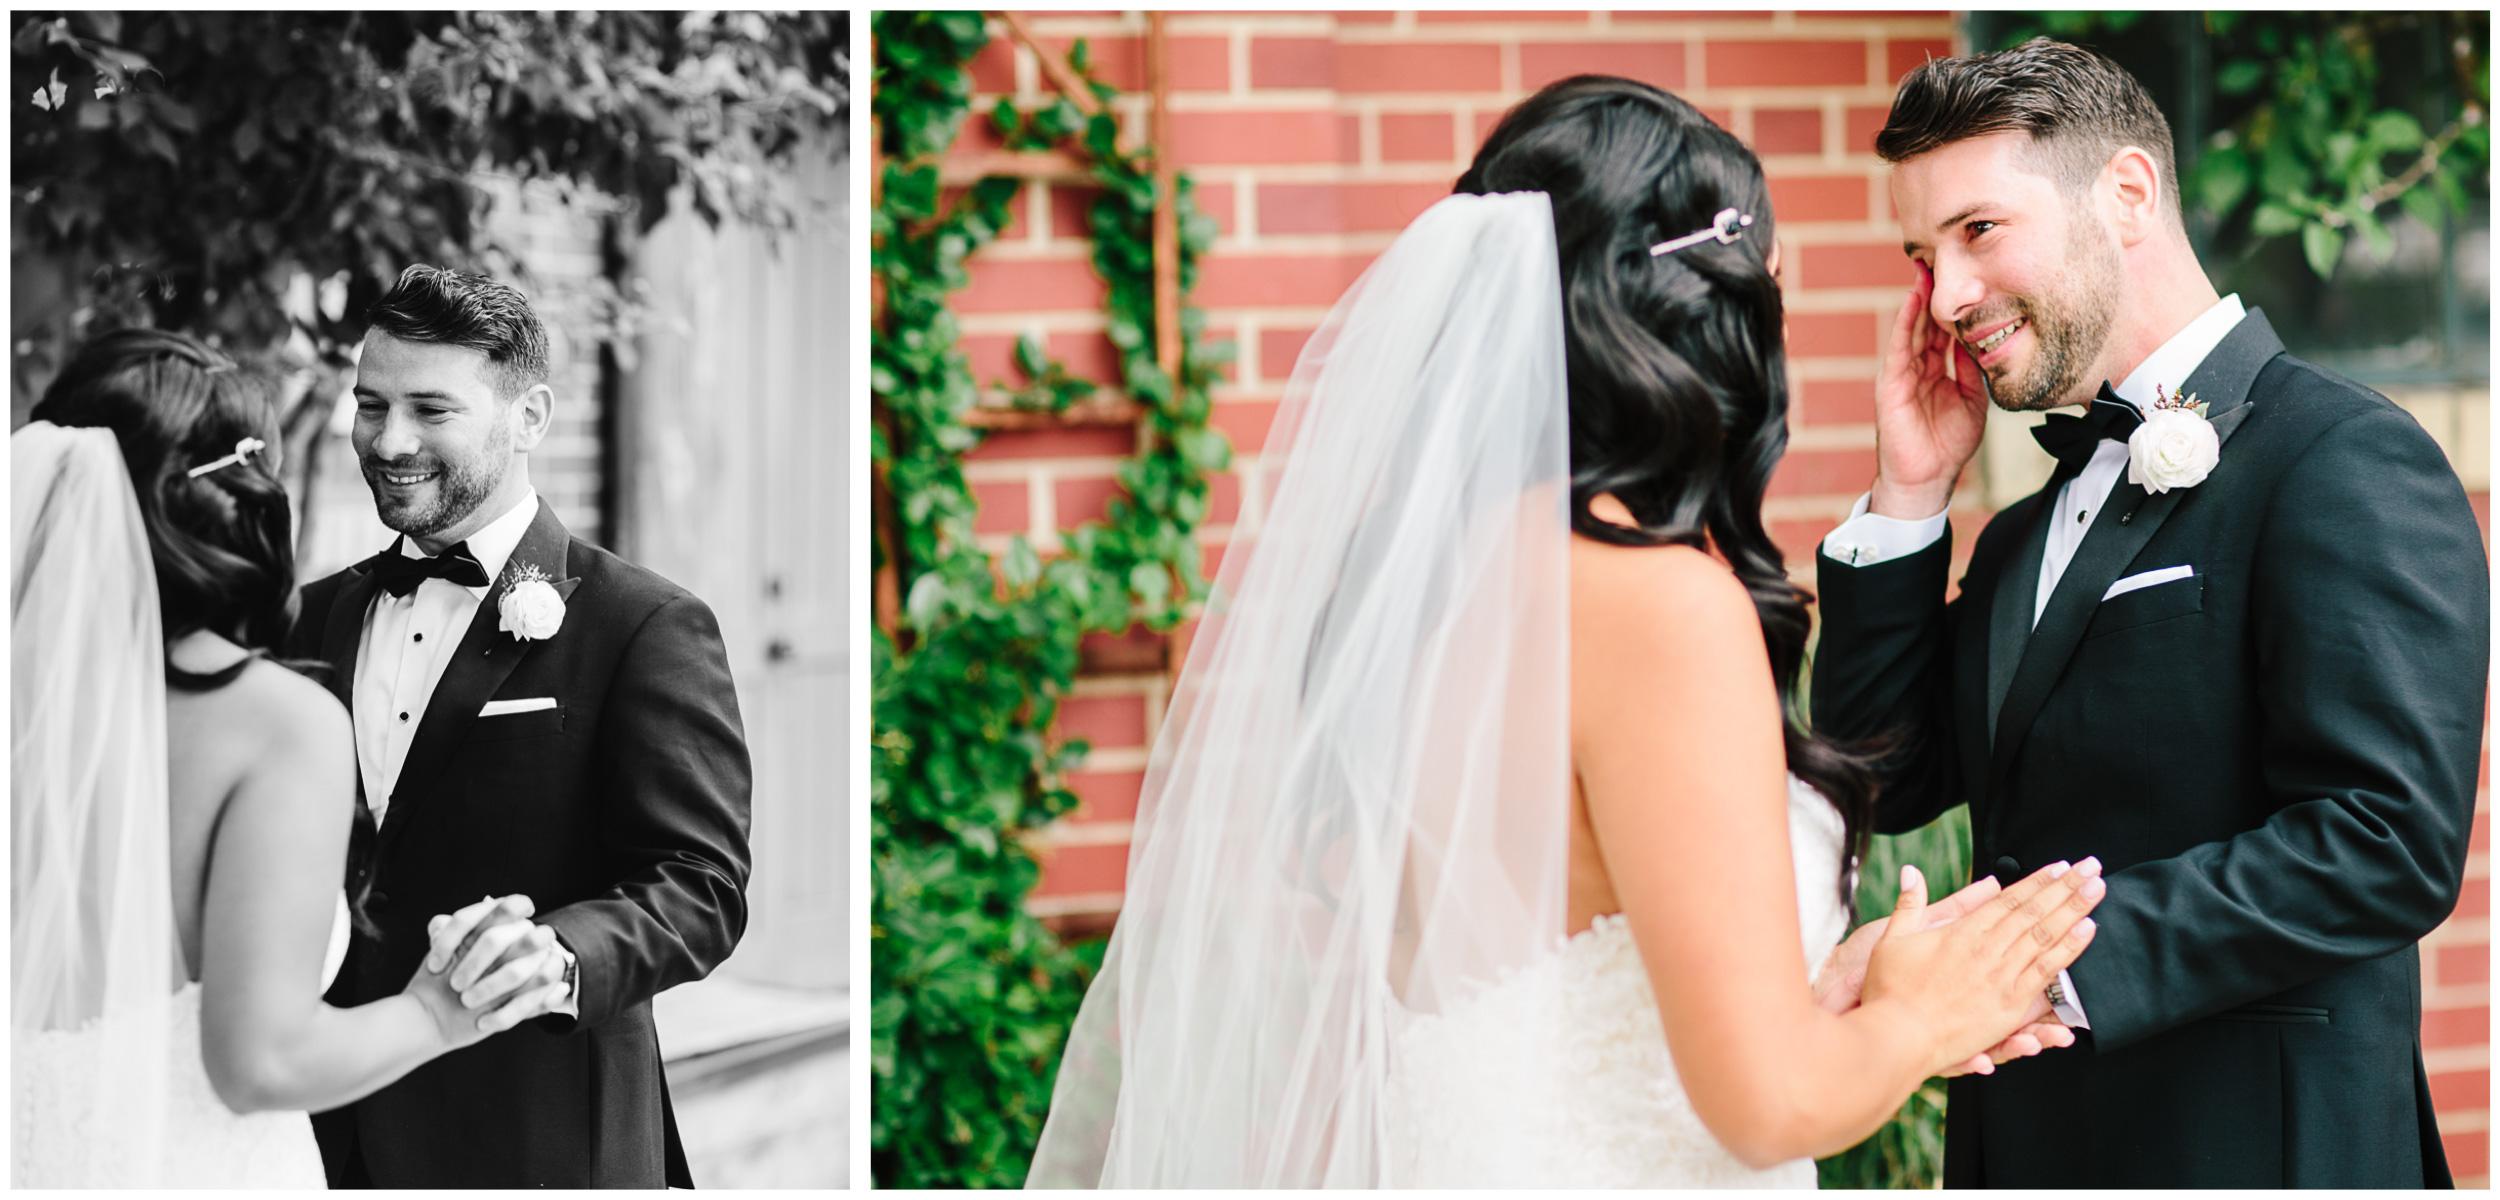 moss_denver_wedding_19.jpg